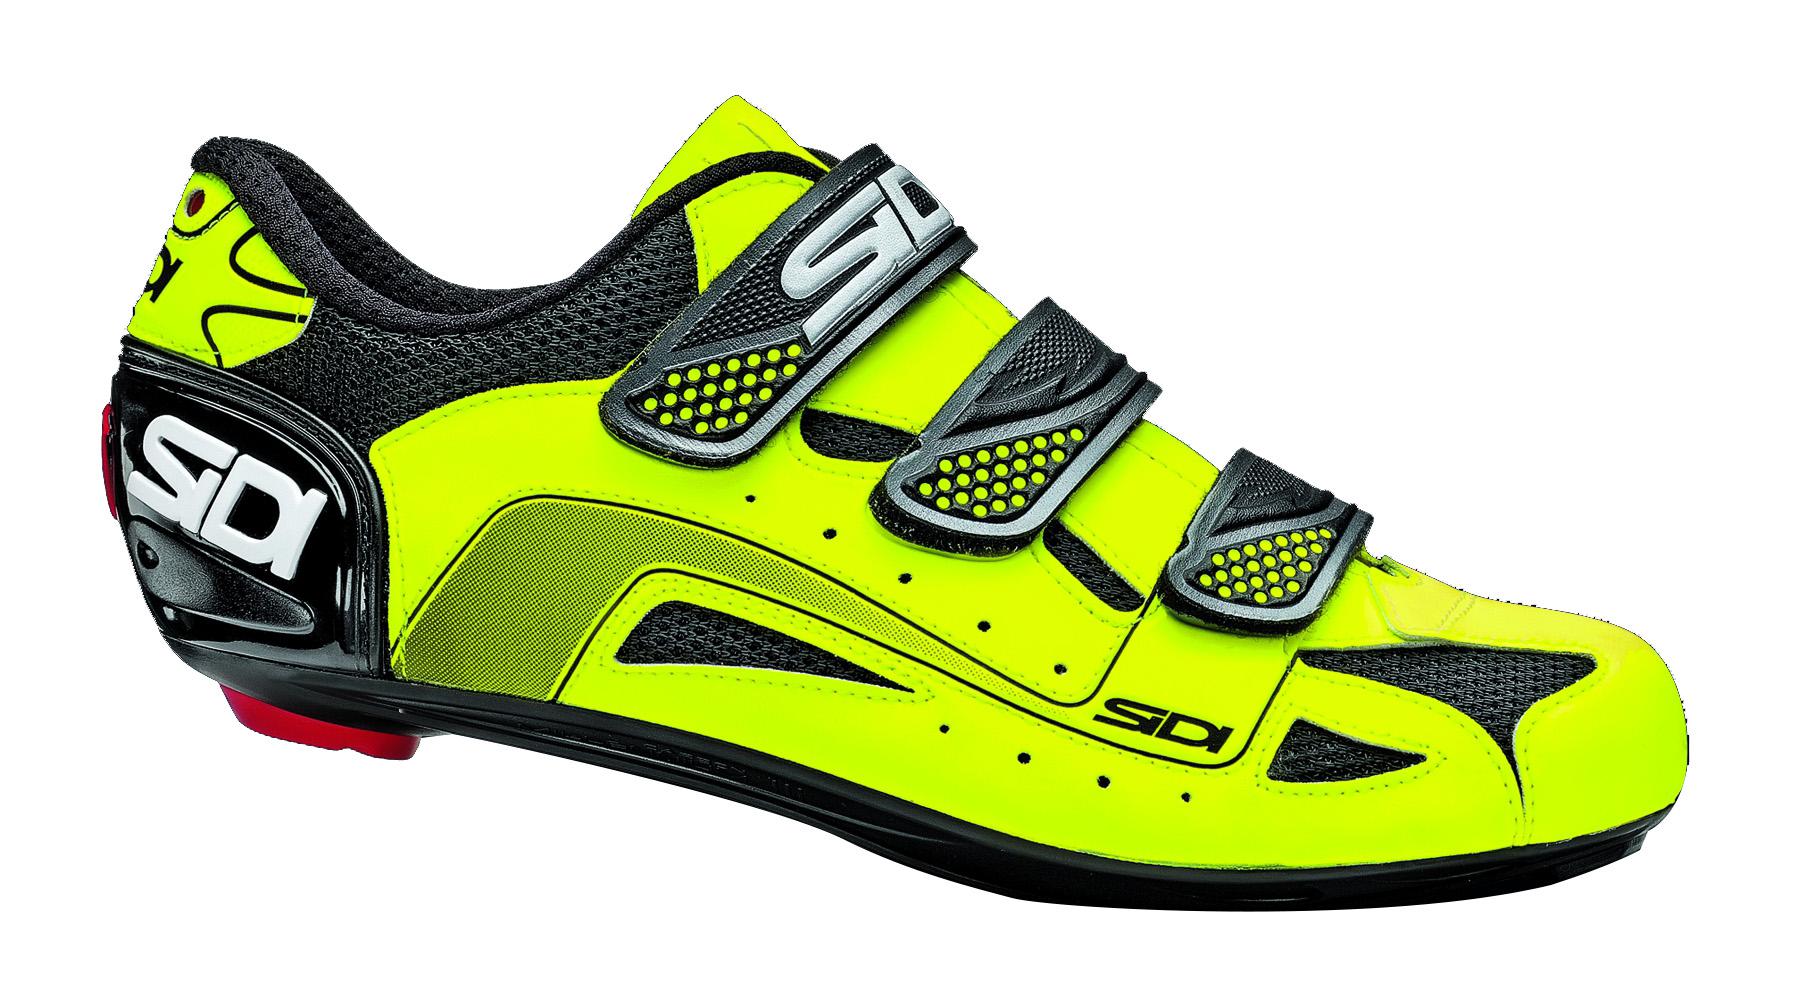 chaussures route sidi tarus 2013 noir jaune fluo. Black Bedroom Furniture Sets. Home Design Ideas